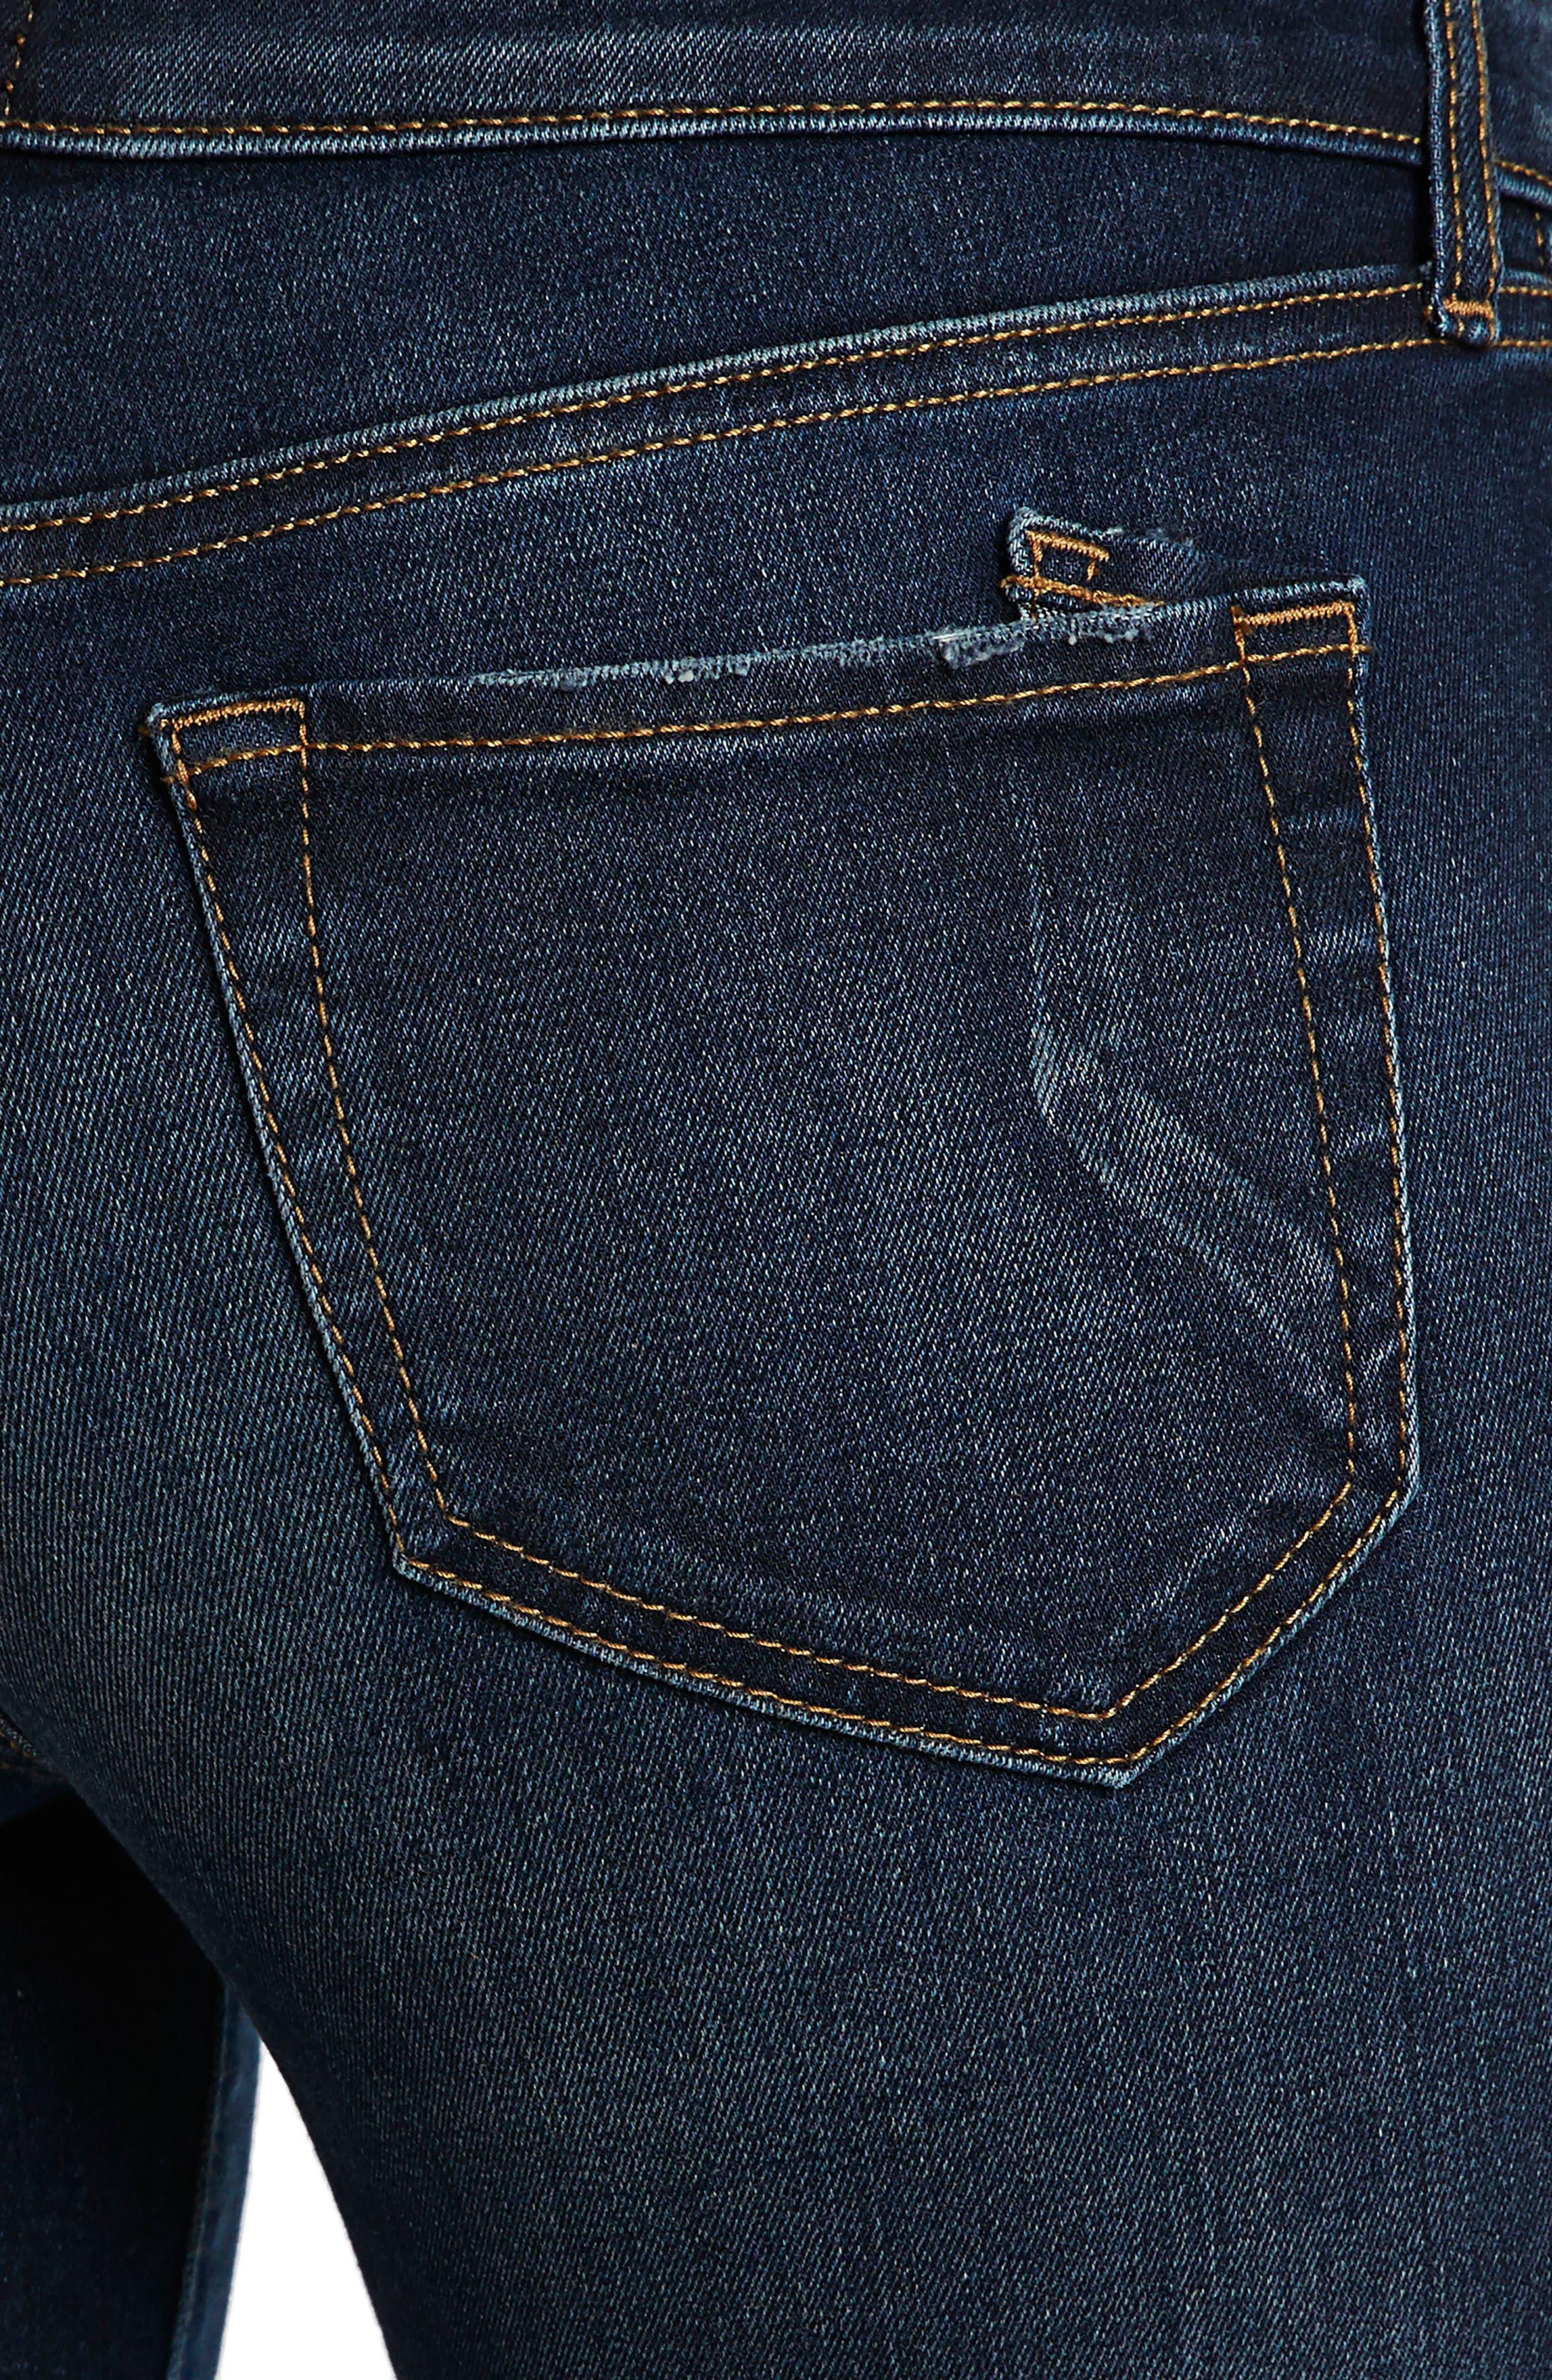 Camaro Ankle Skinny Jeans,                             Alternate thumbnail 4, color,                             Indigo